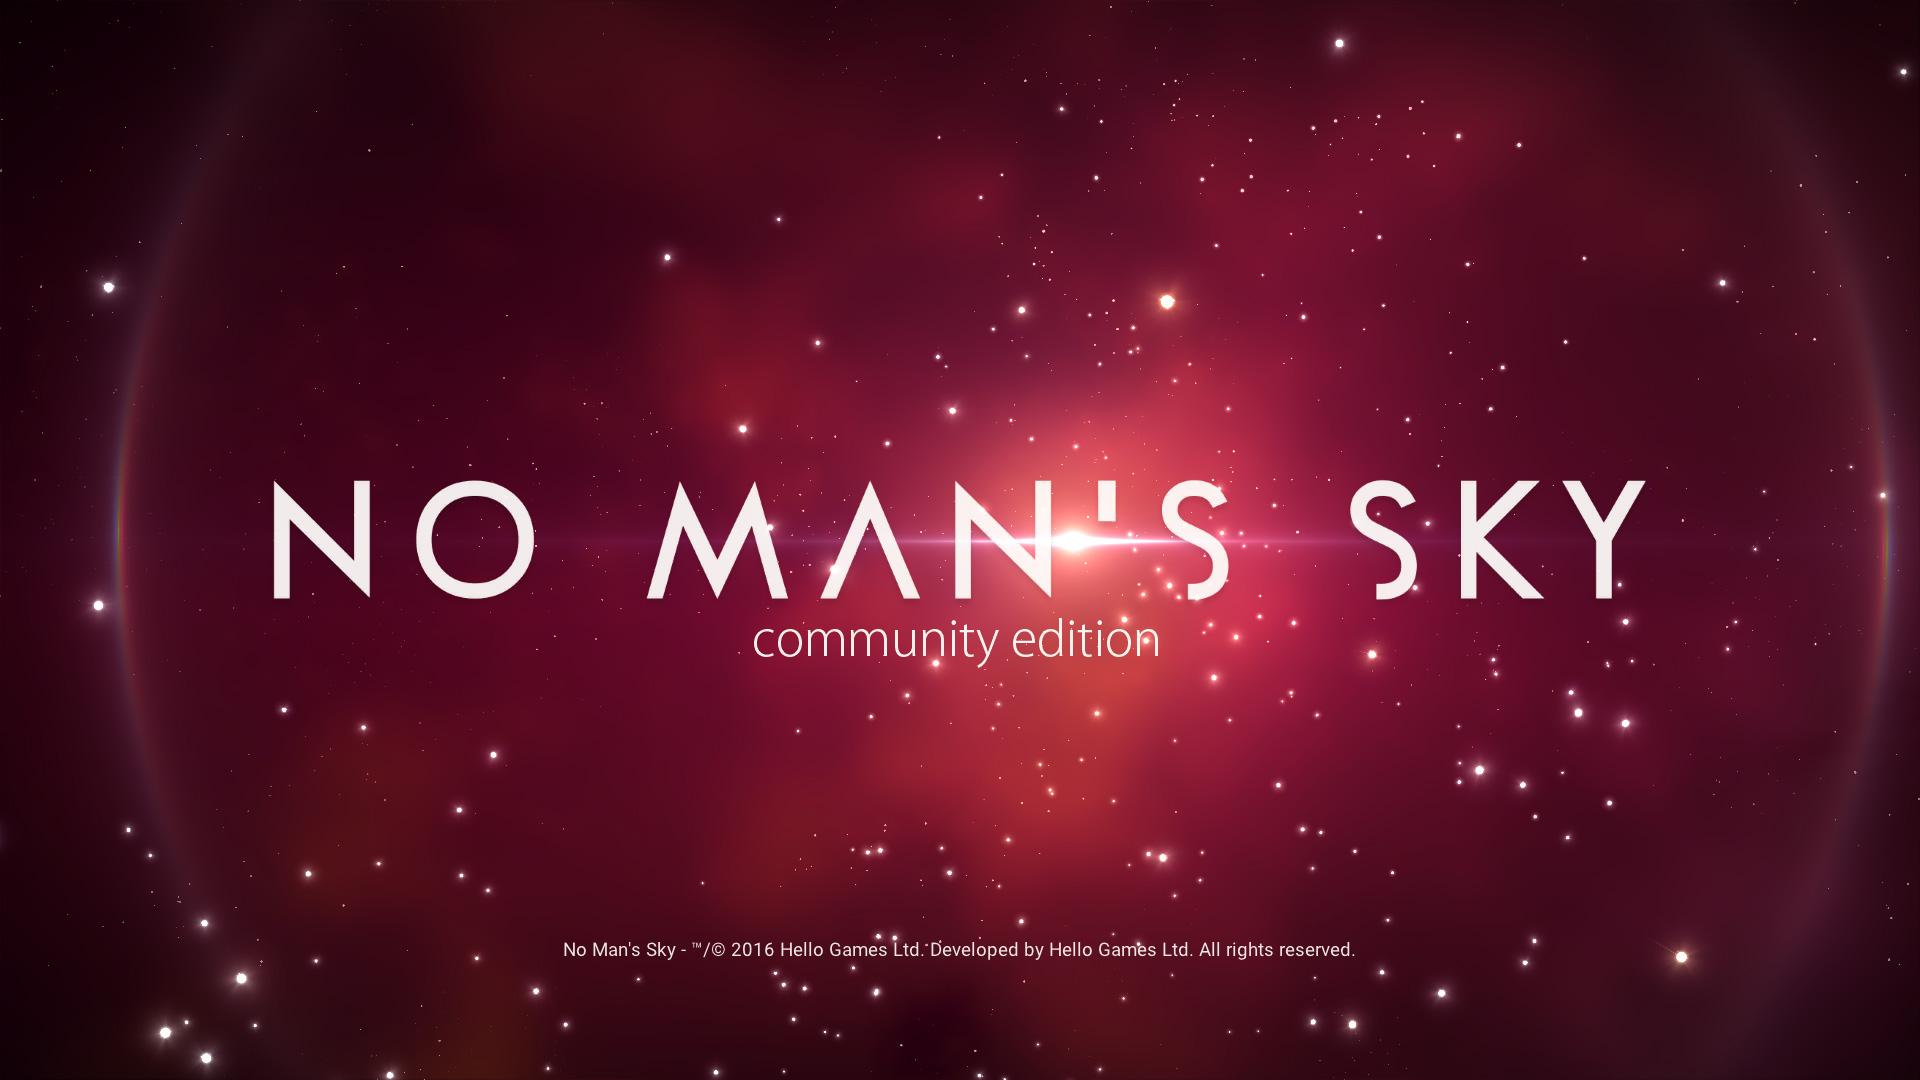 Community Edition Title